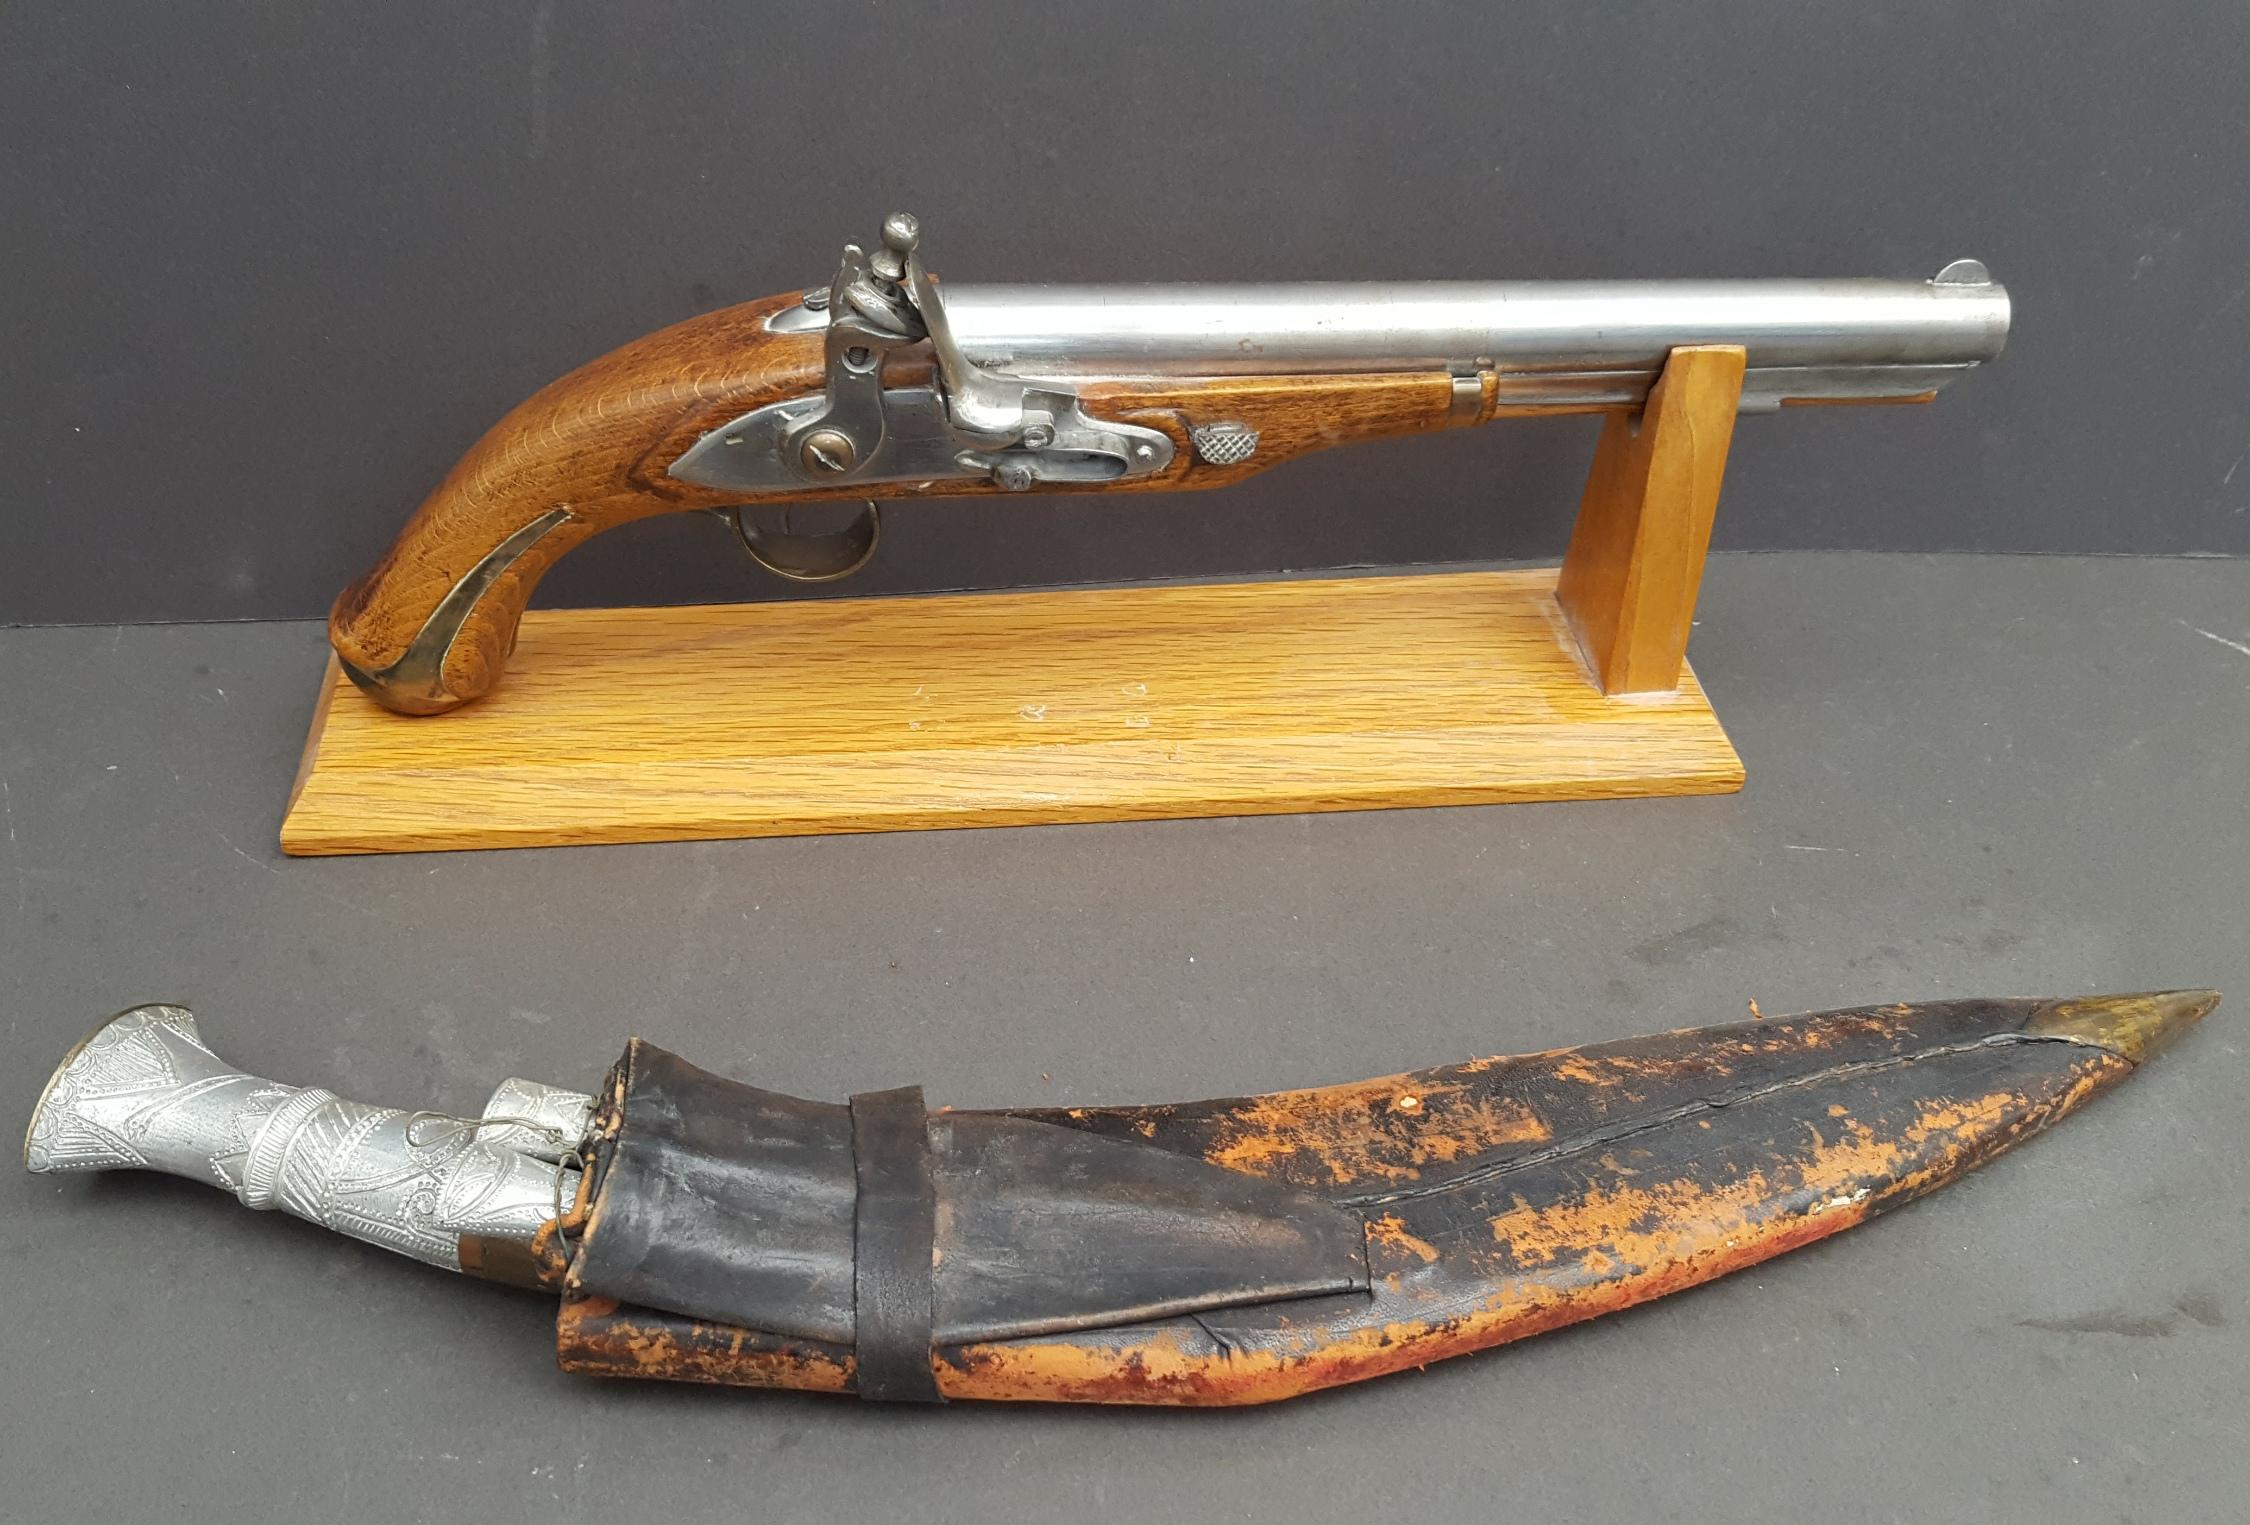 Lot 29 - Vintage Military Items Replica Flintlock Pistol & Gurkha Kukri Knife